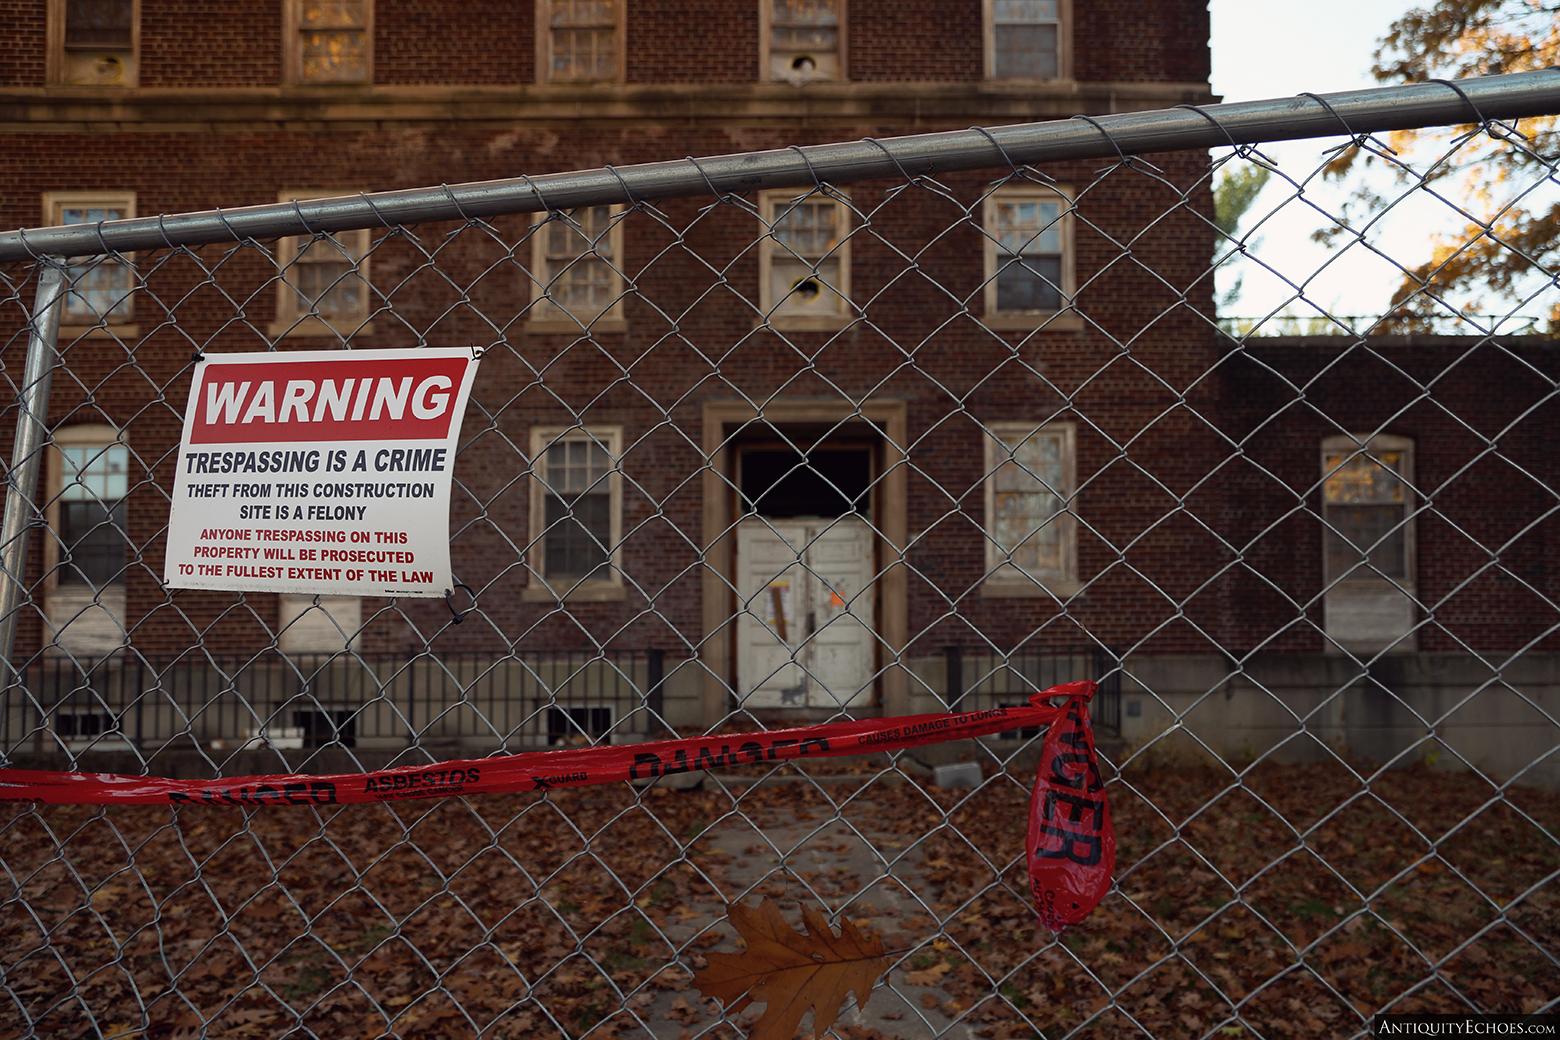 Allentown State Hospital - No Tresspassing